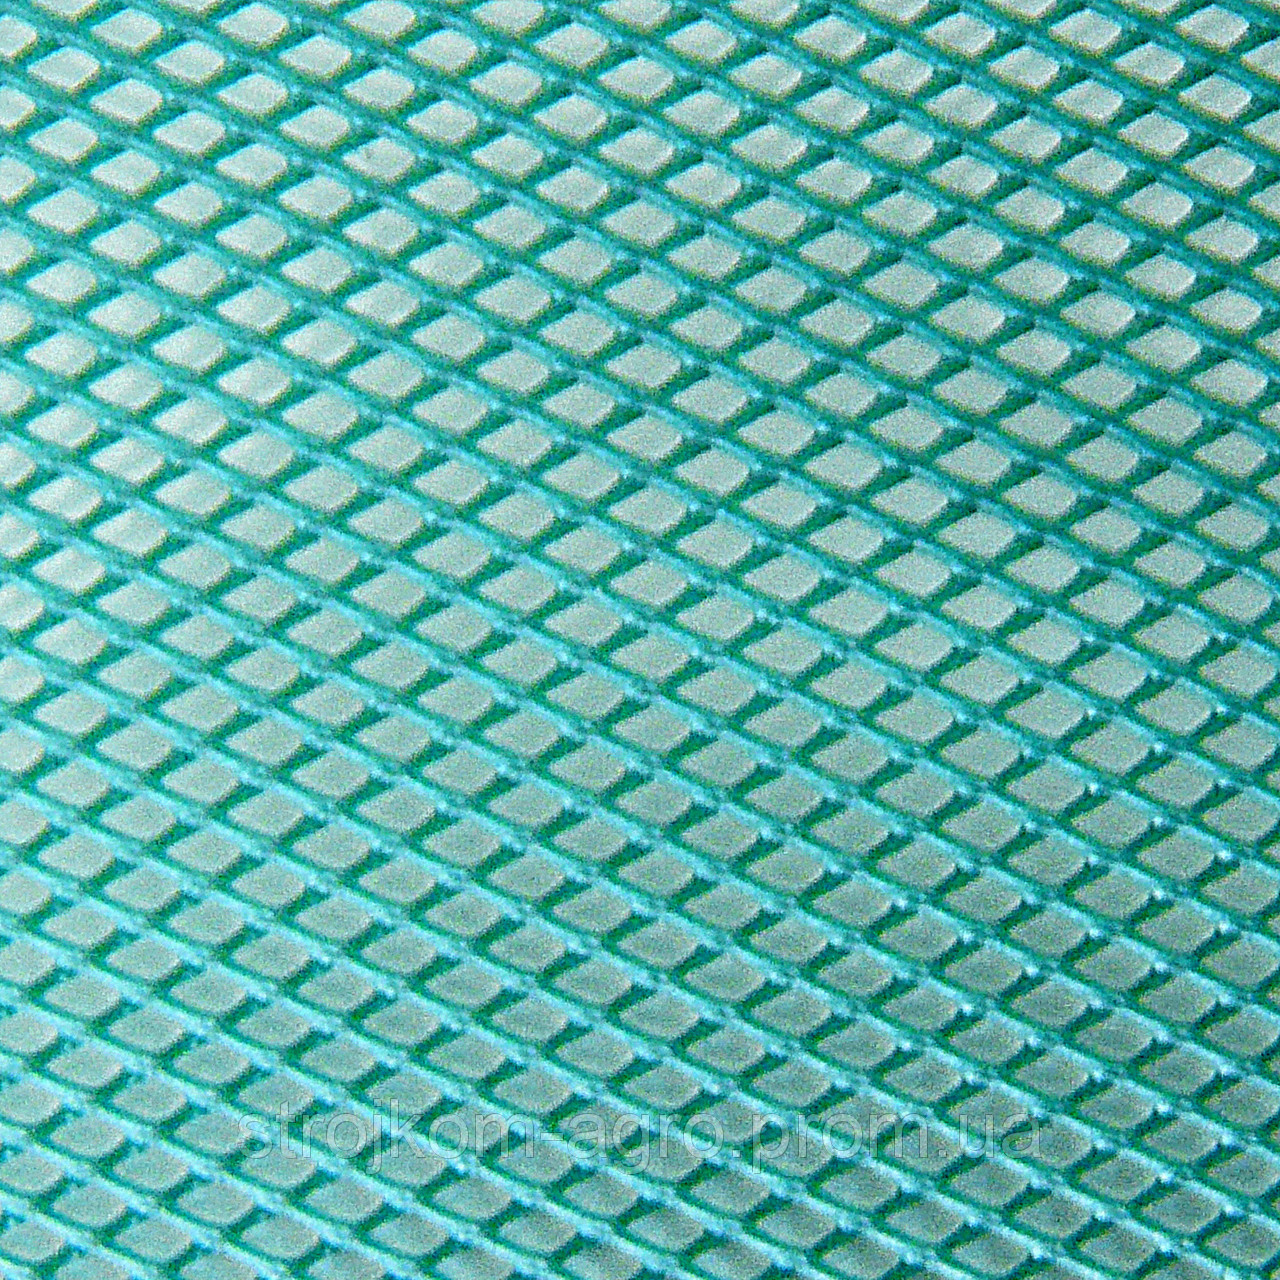 Сетка антимоскитная R-150 Mosquiplast 5361/150 зеленая/белая (1,5х50м)